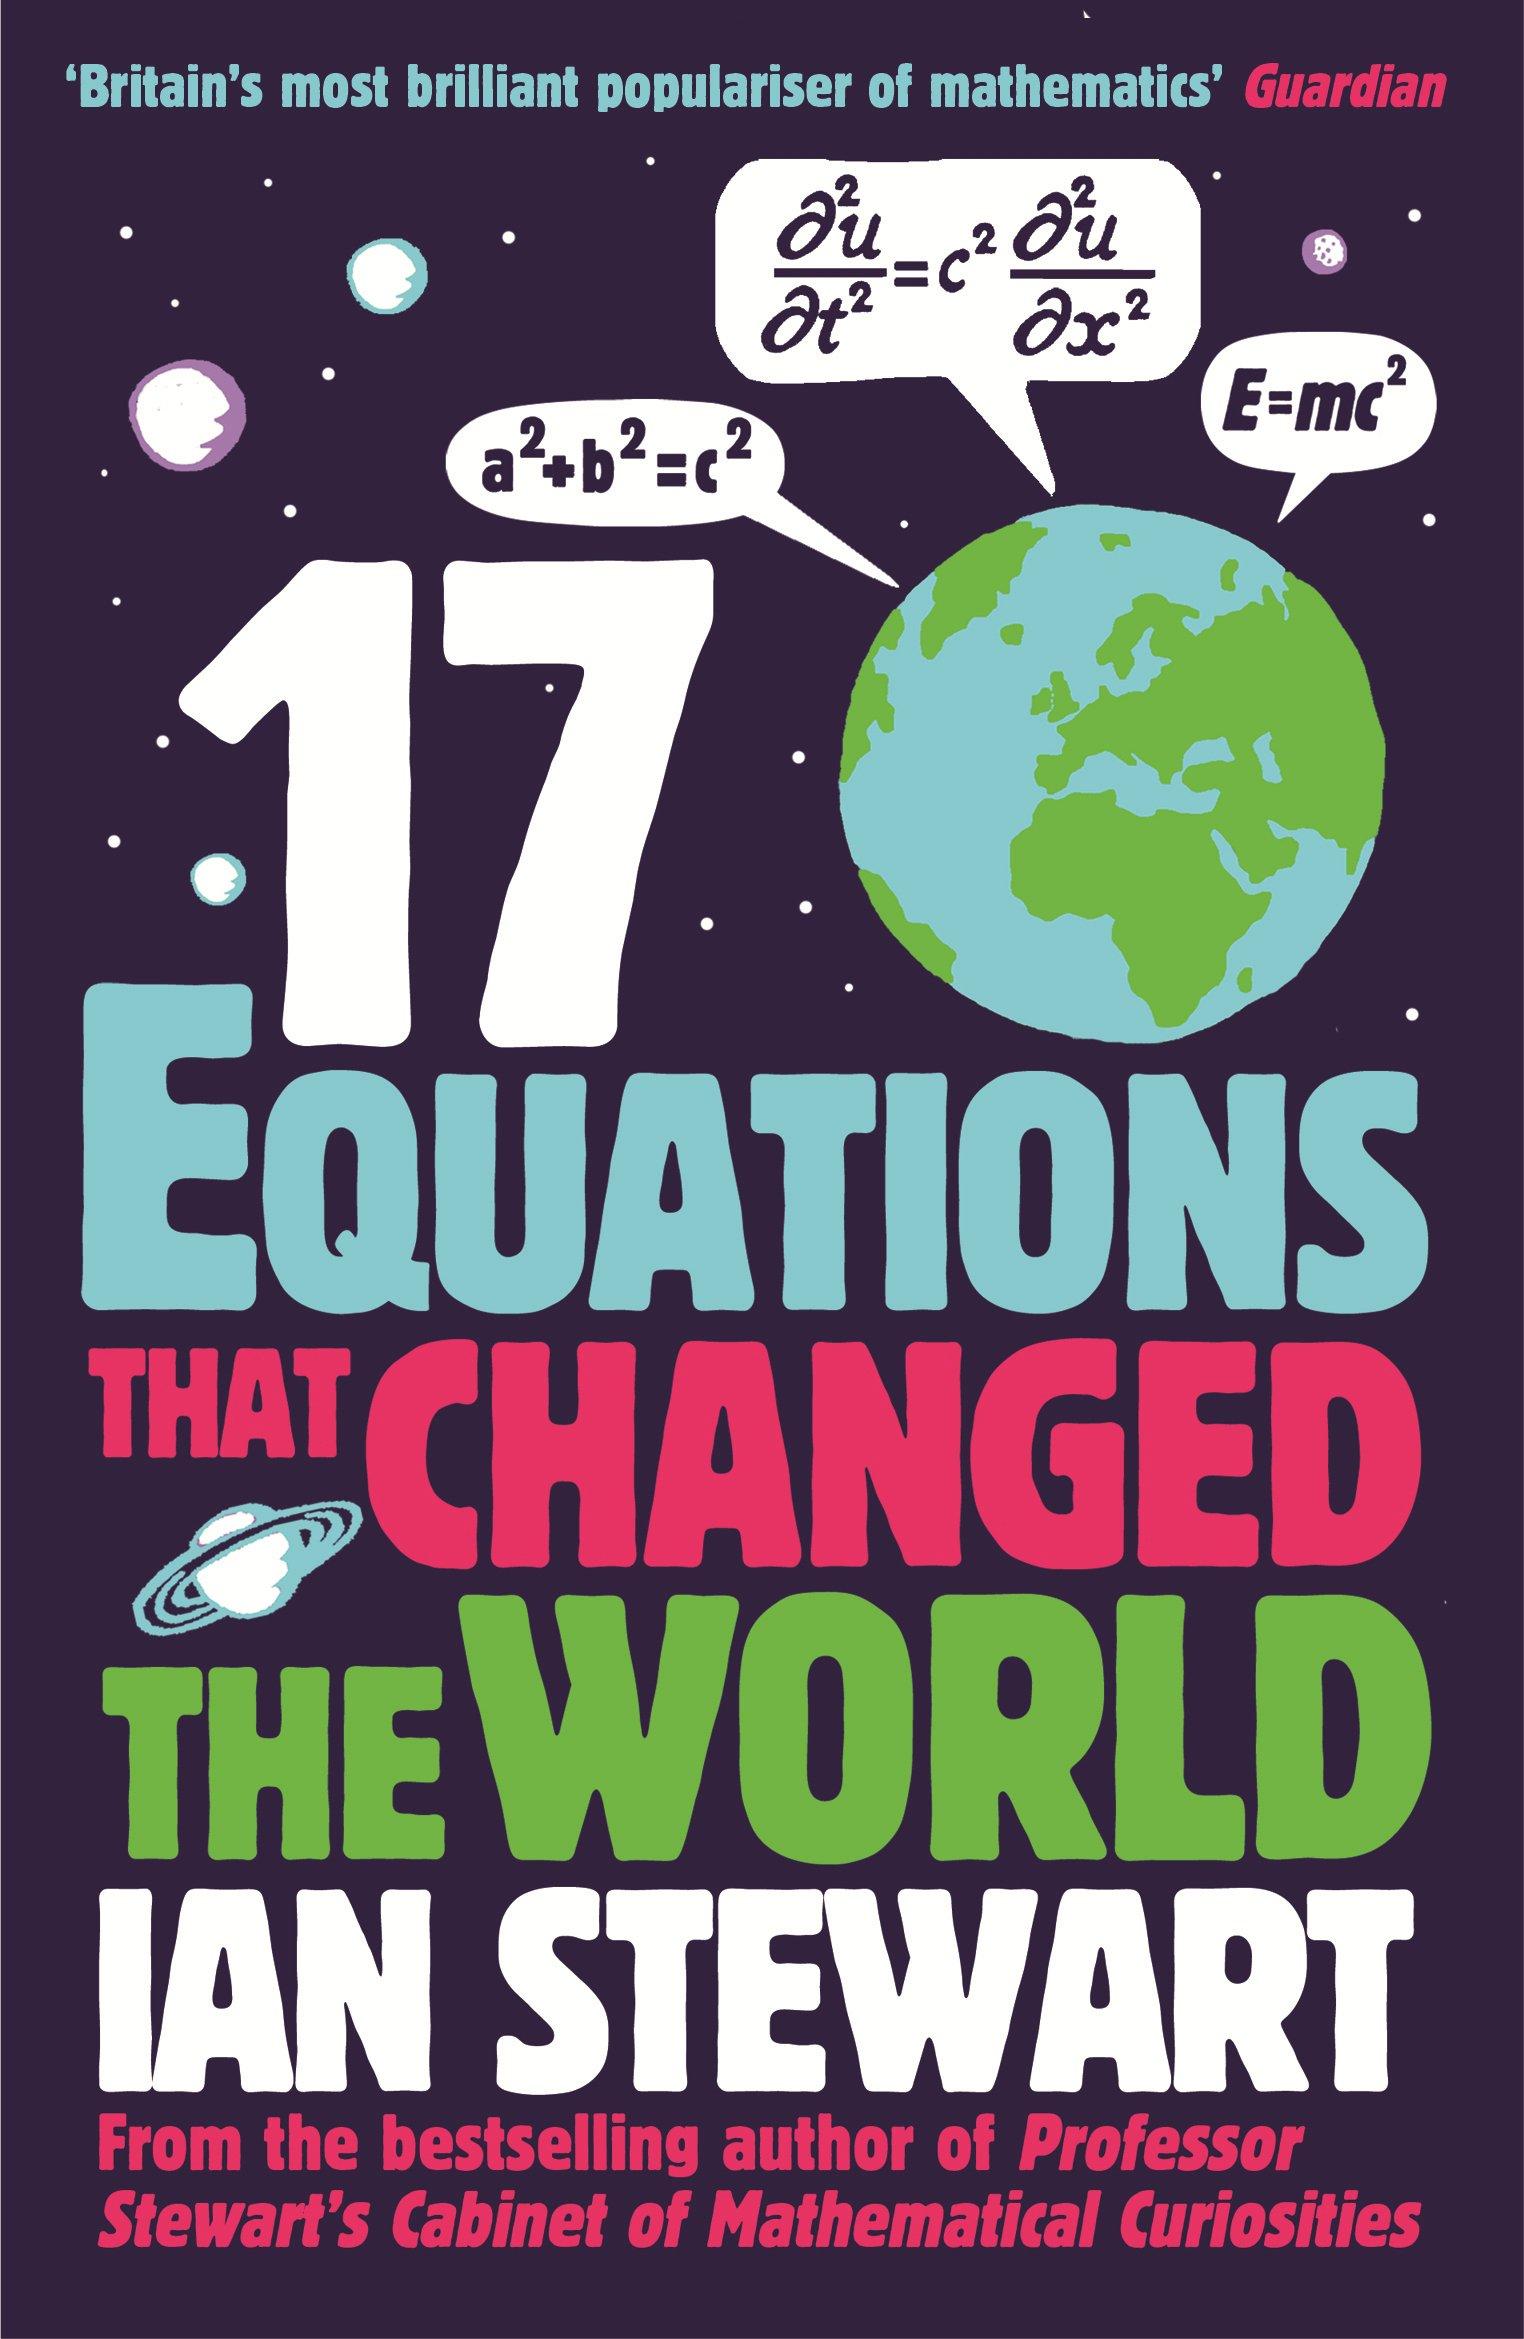 Seventeen Equations that Changed the World: Amazon.co.uk: Professor Ian  Stewart, John Davey: 9781846685323: Books